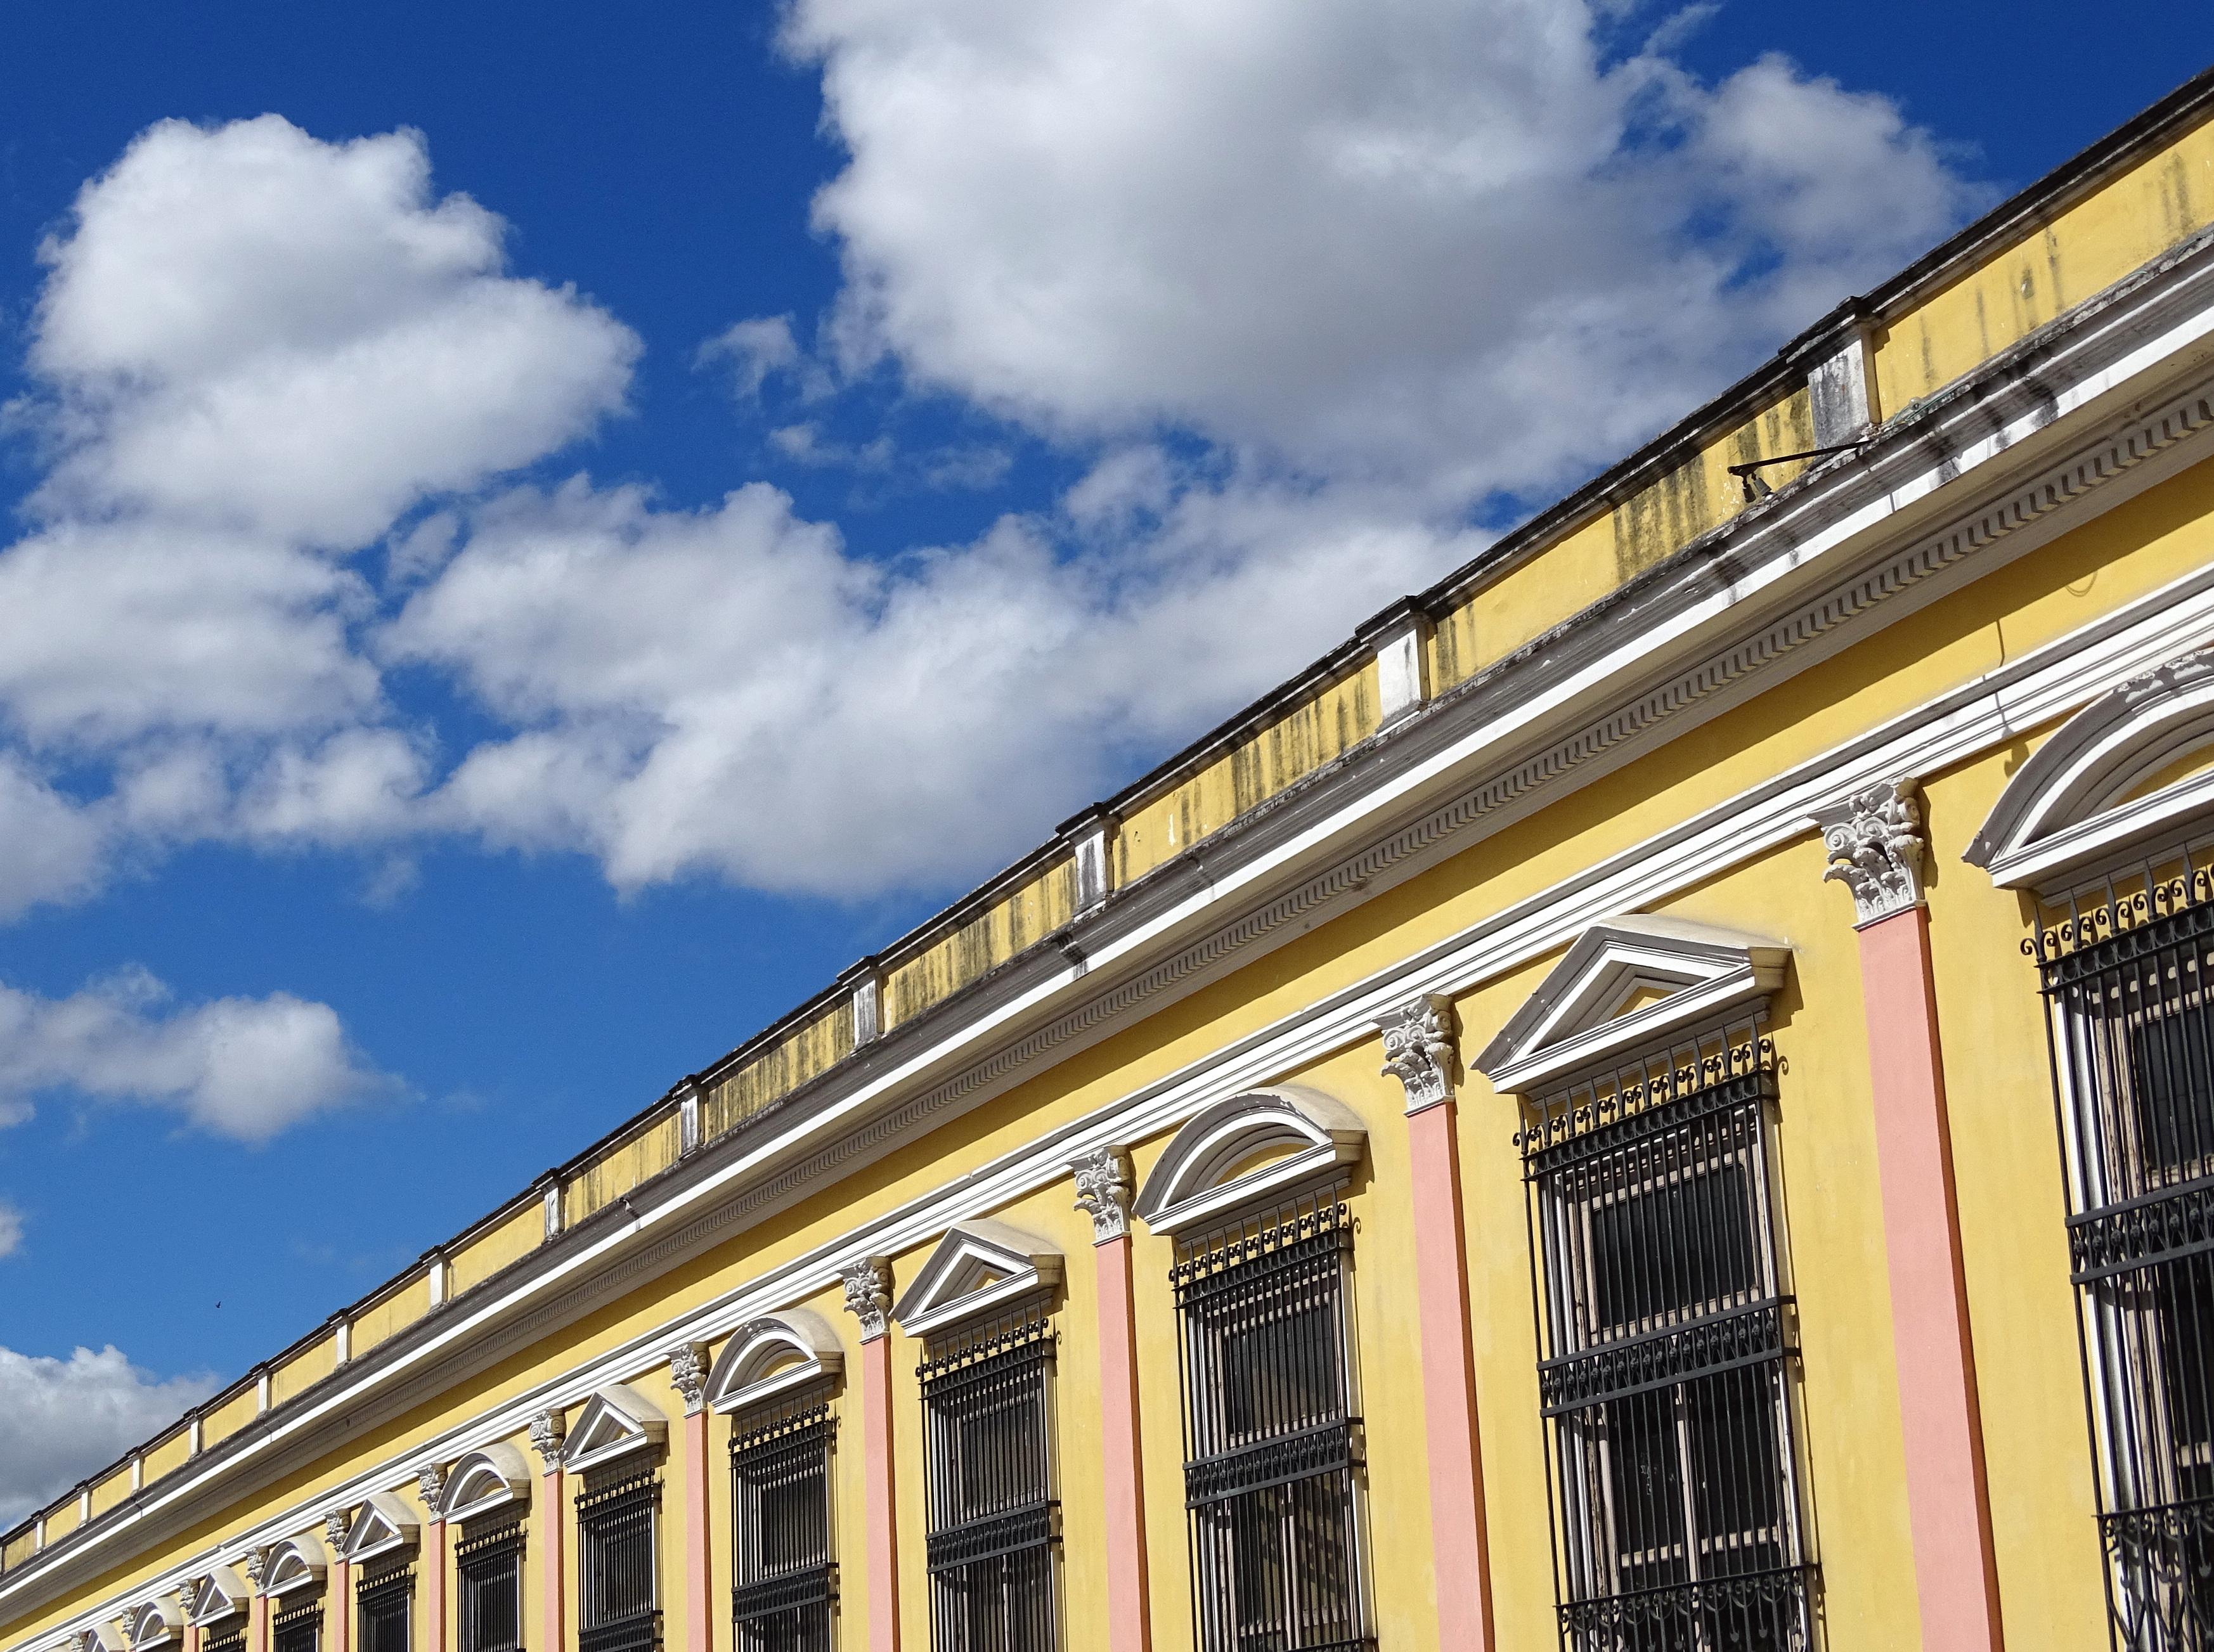 File:Architectural Detail - Quetzaltenango (Xela) - Guatemala - 01